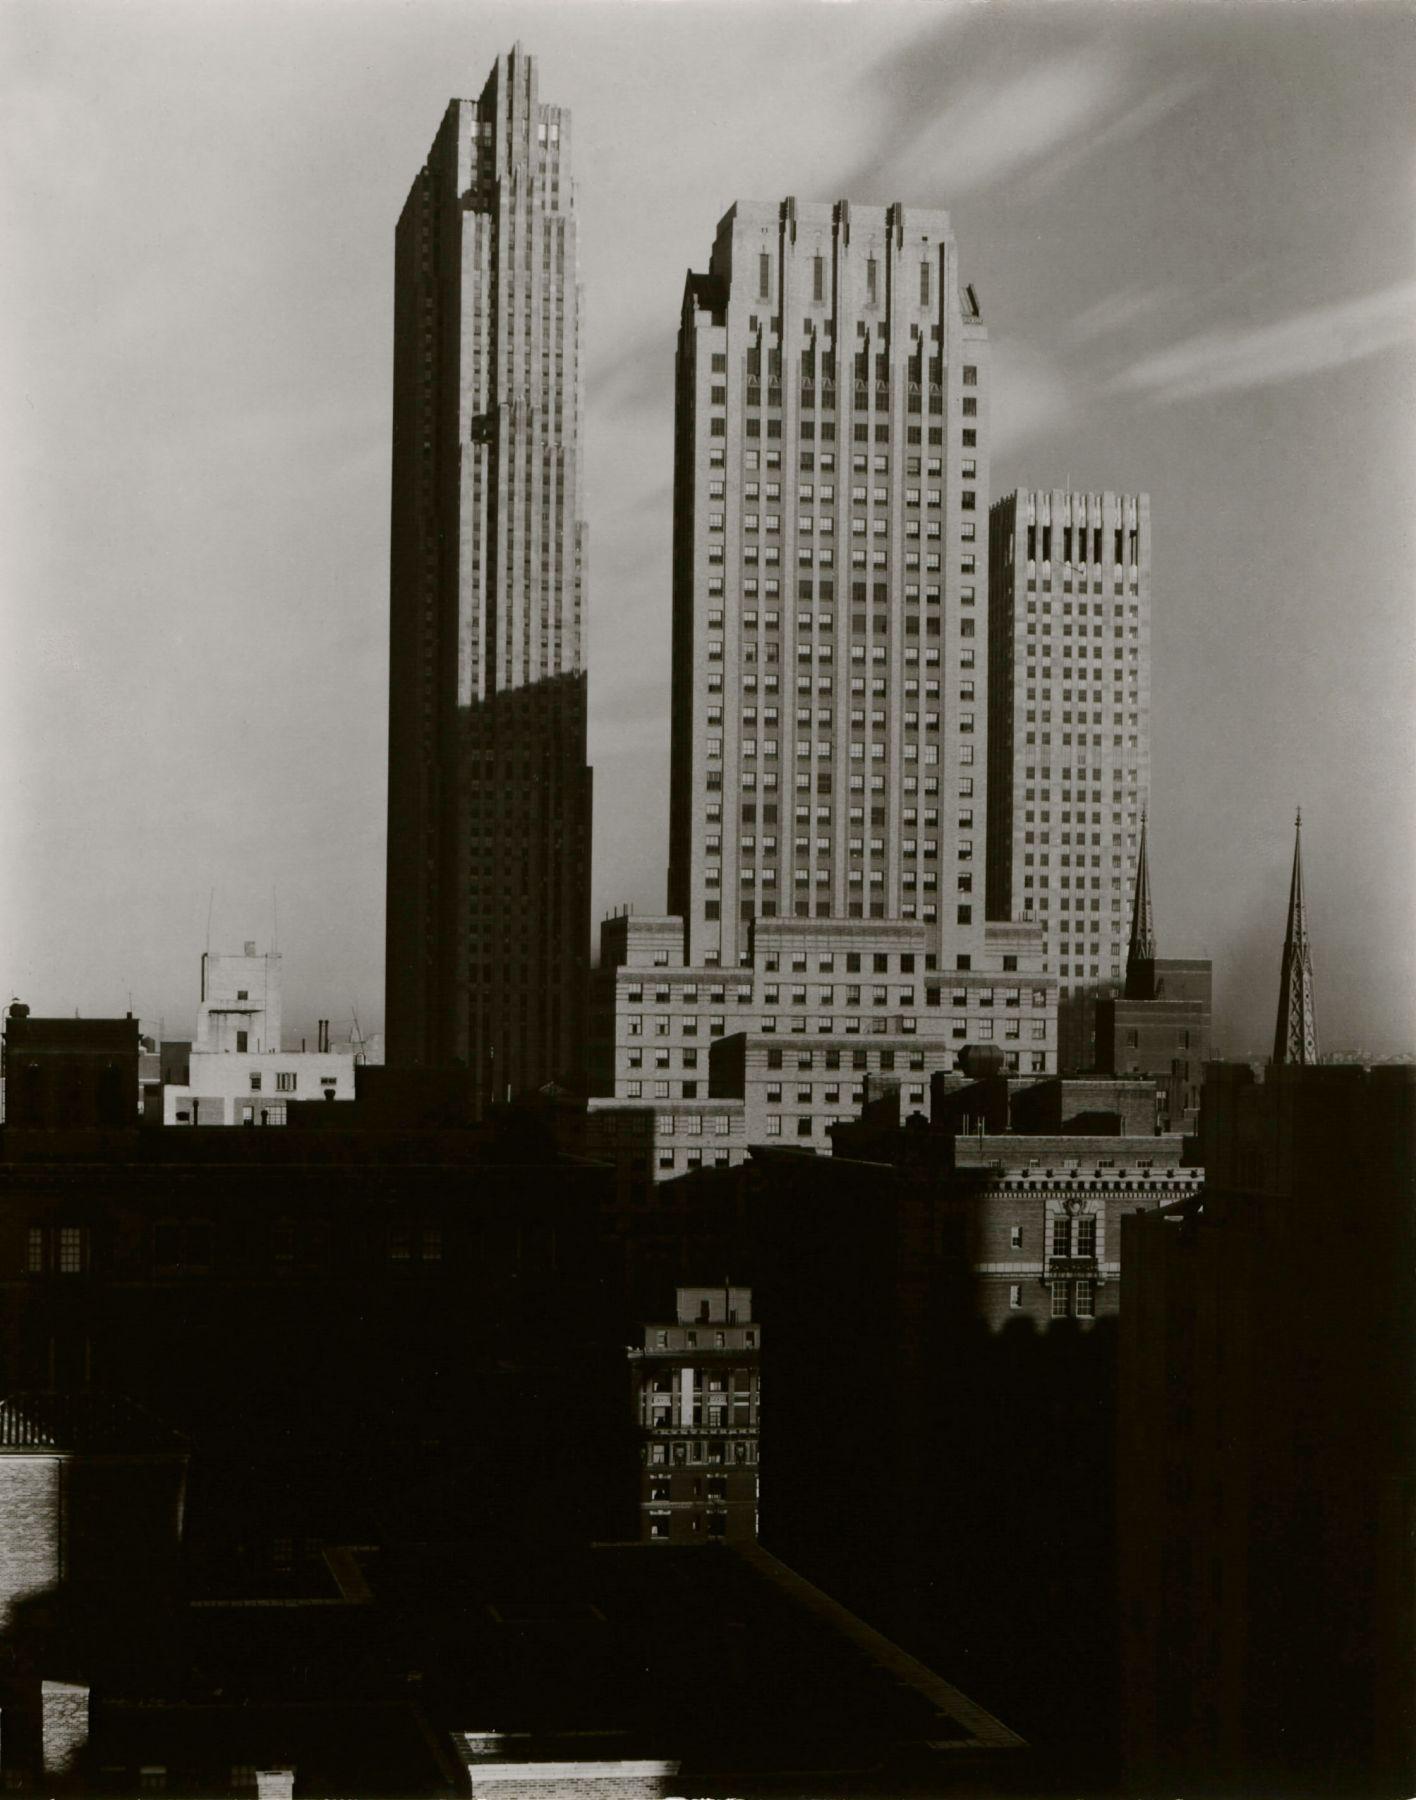 alfred Stieglitz new york, from the shelton